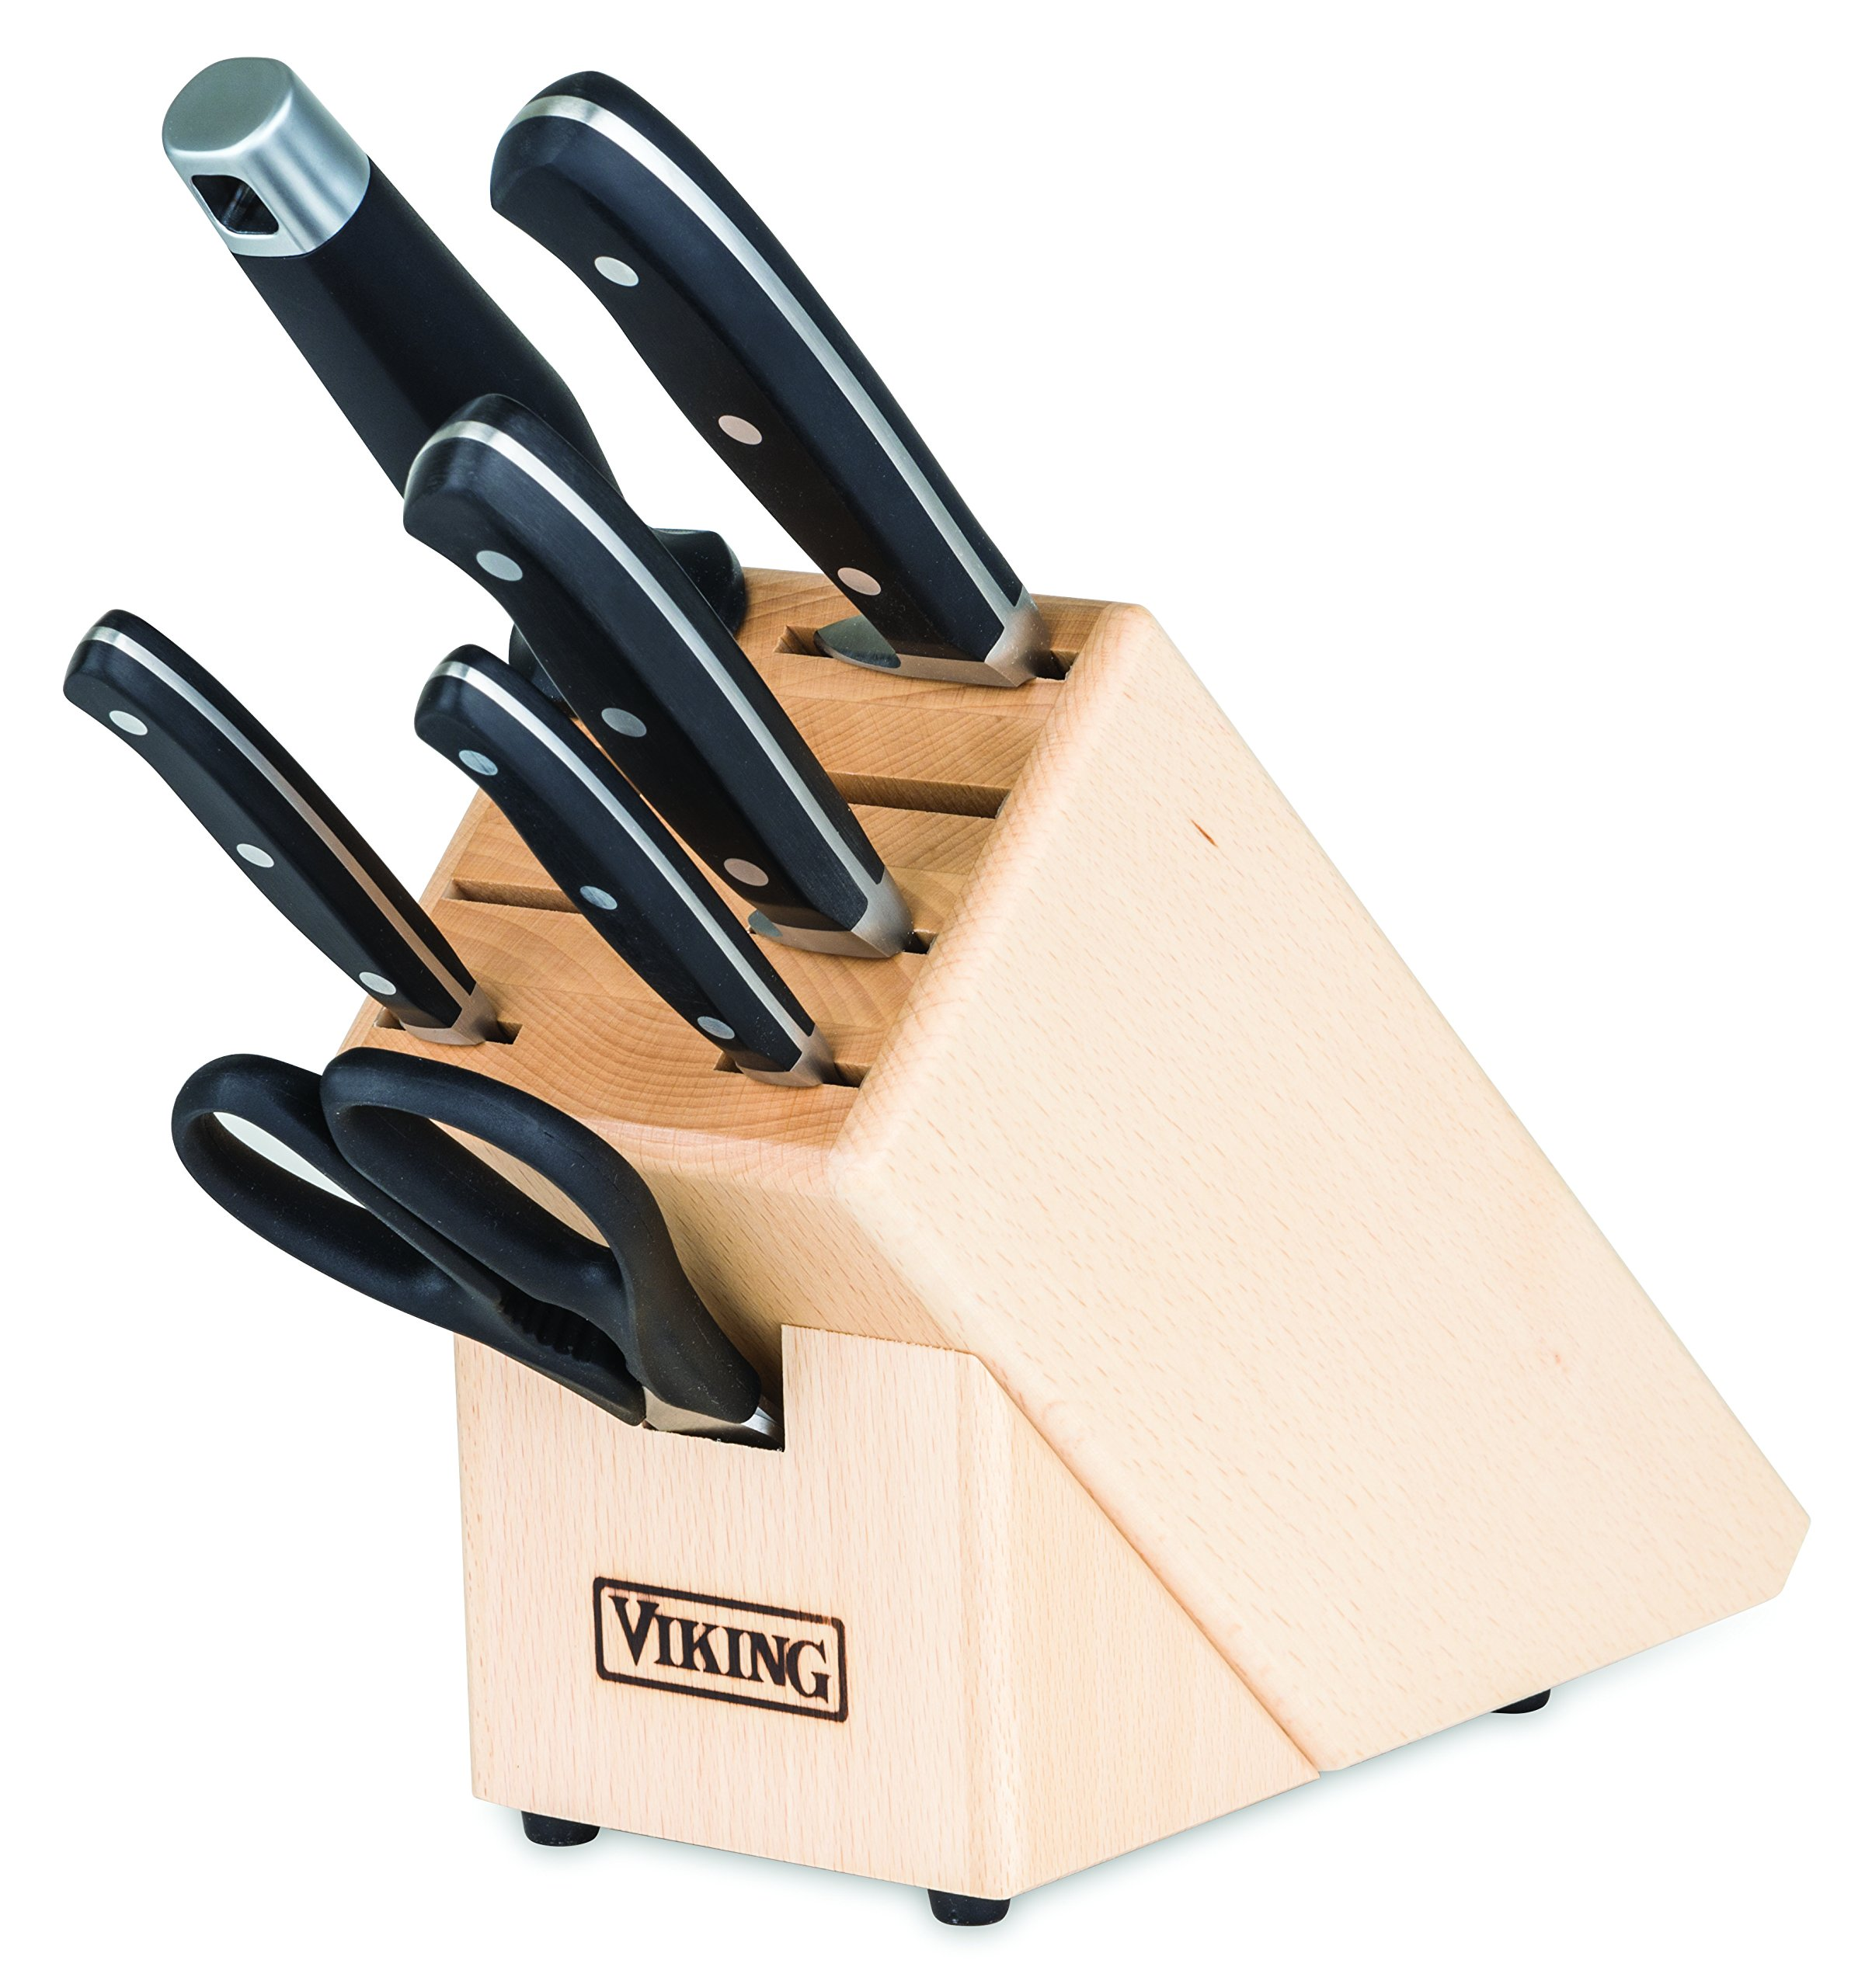 Viking Professional 7 Piece Cutlery Set